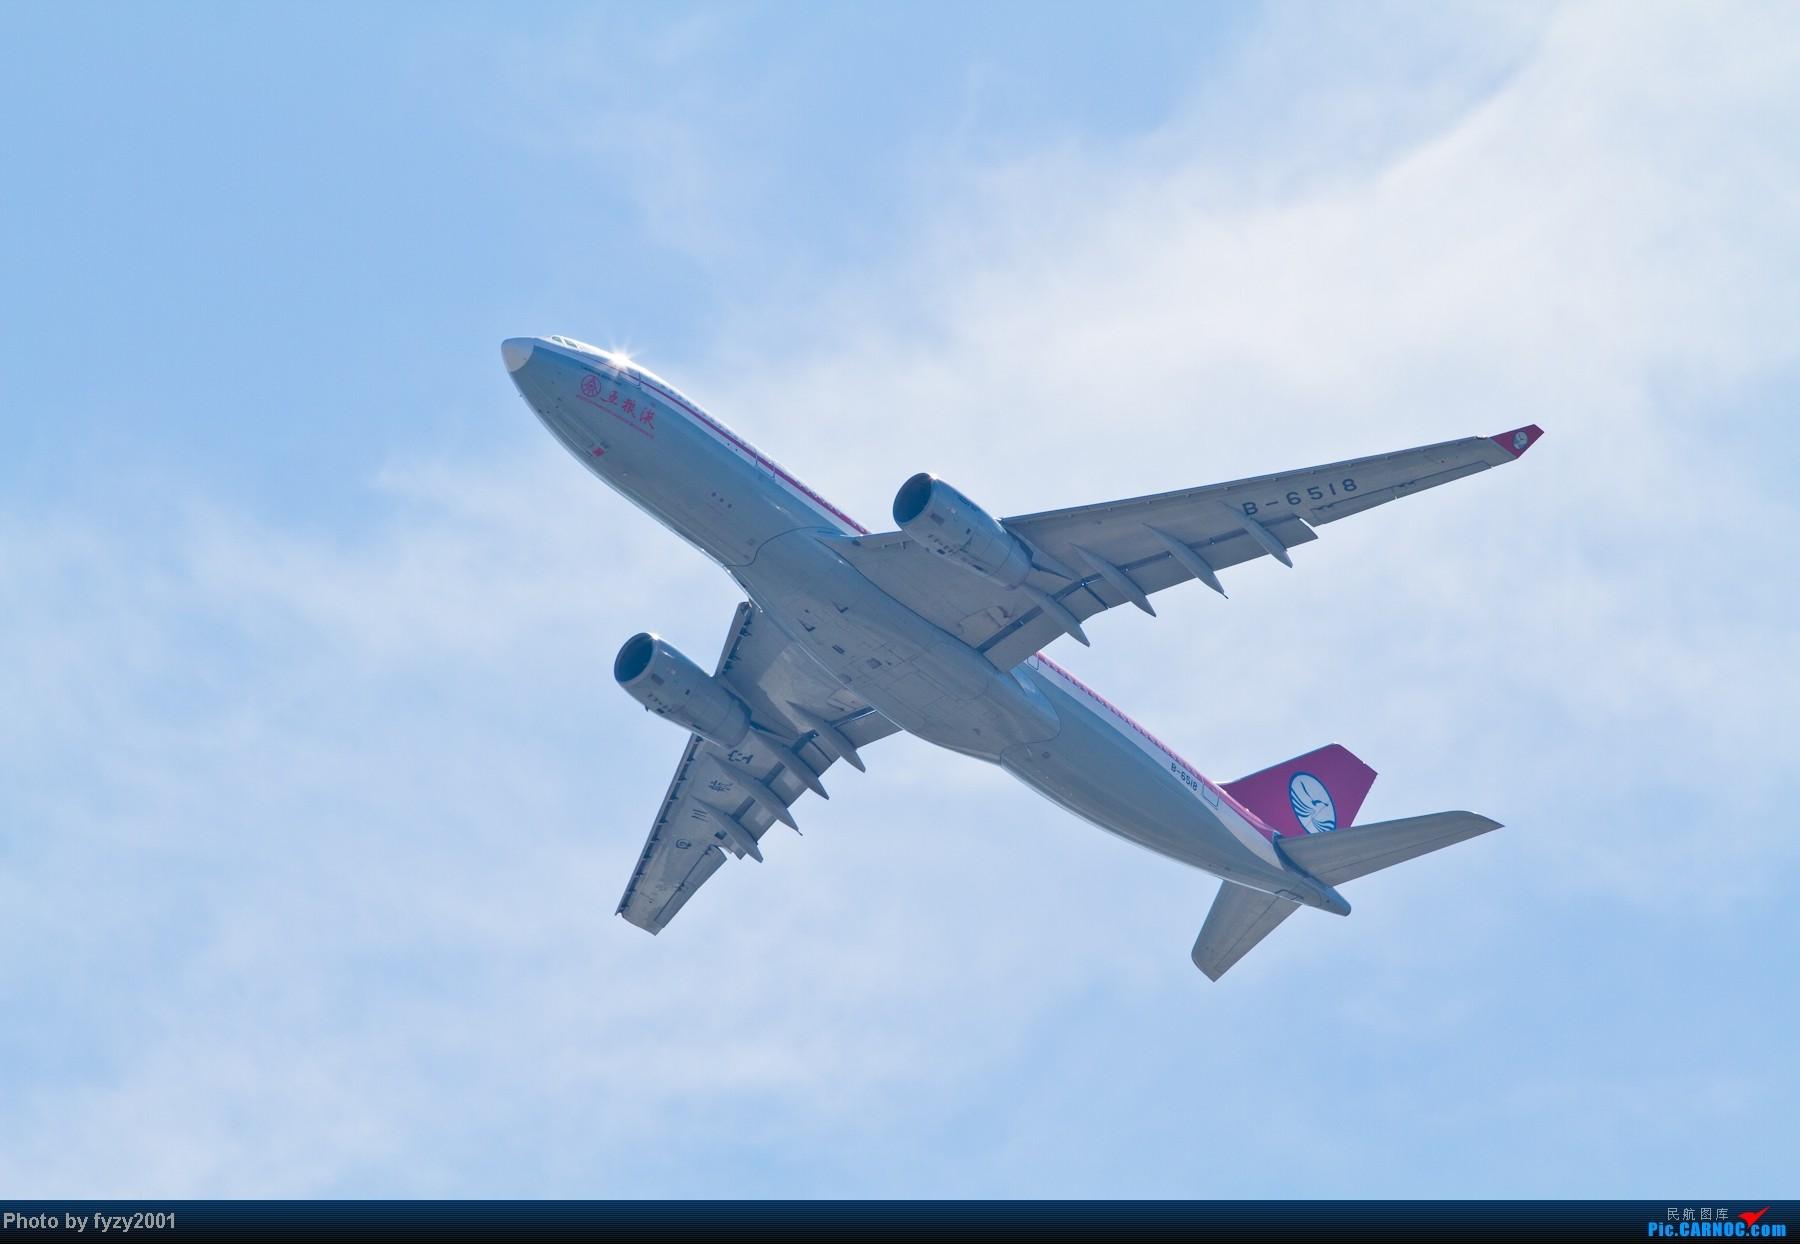 Re:[原创][无锡西站]长假PVG蹲守~~~~只发大图,多图杀猫~~~~ AIRBUS A330-200 B-6518 中国上海浦东机场